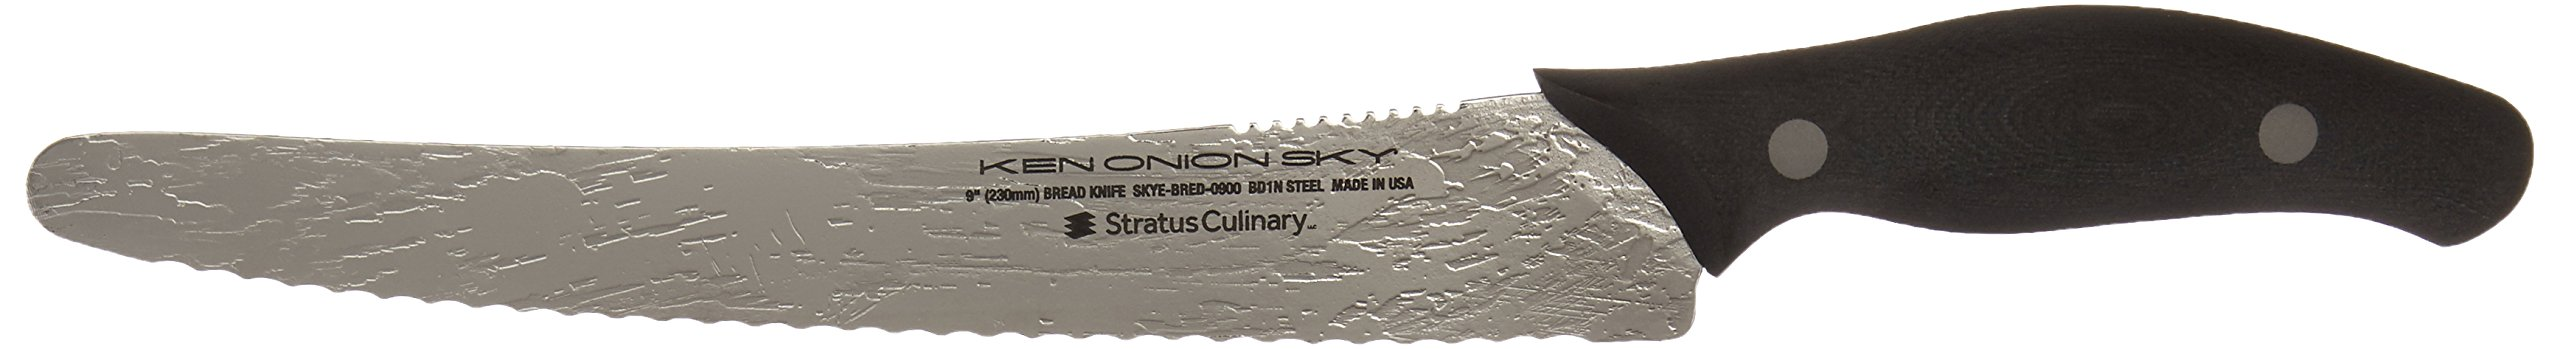 Stratus Culinary Ken Onion SKY Bread Knife, 9-Inch, Silver